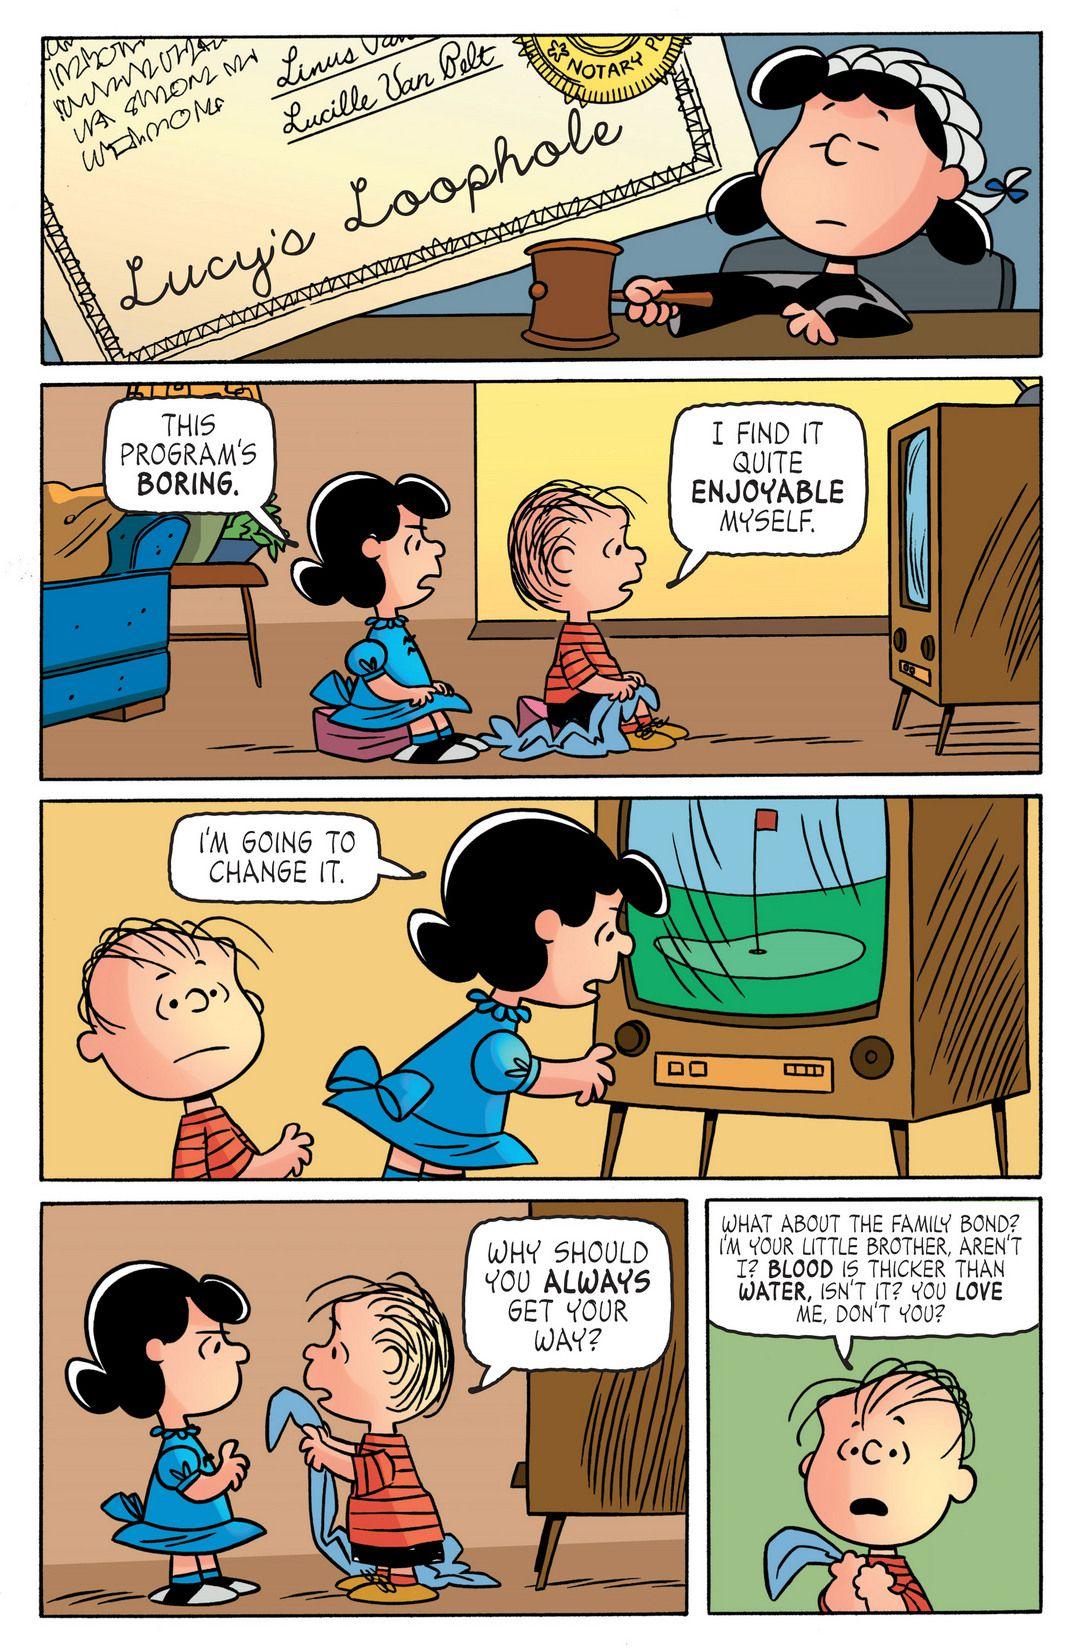 All Star Peanuts Set : Snoopy Schroeder Lucy Van Pelt Woodstock